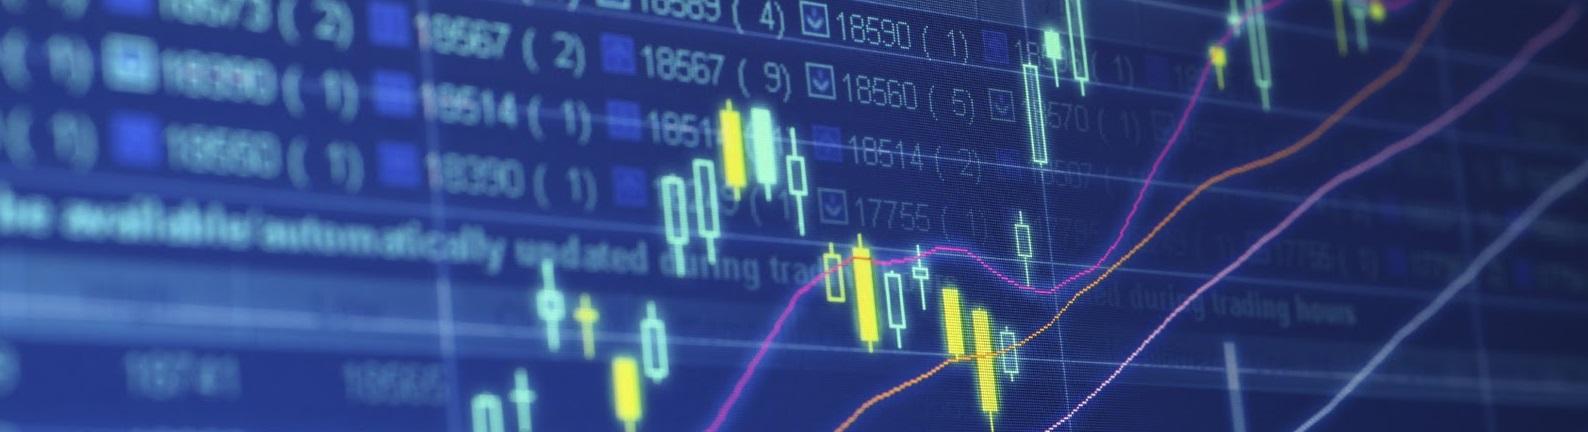 Stock Ticker Graph